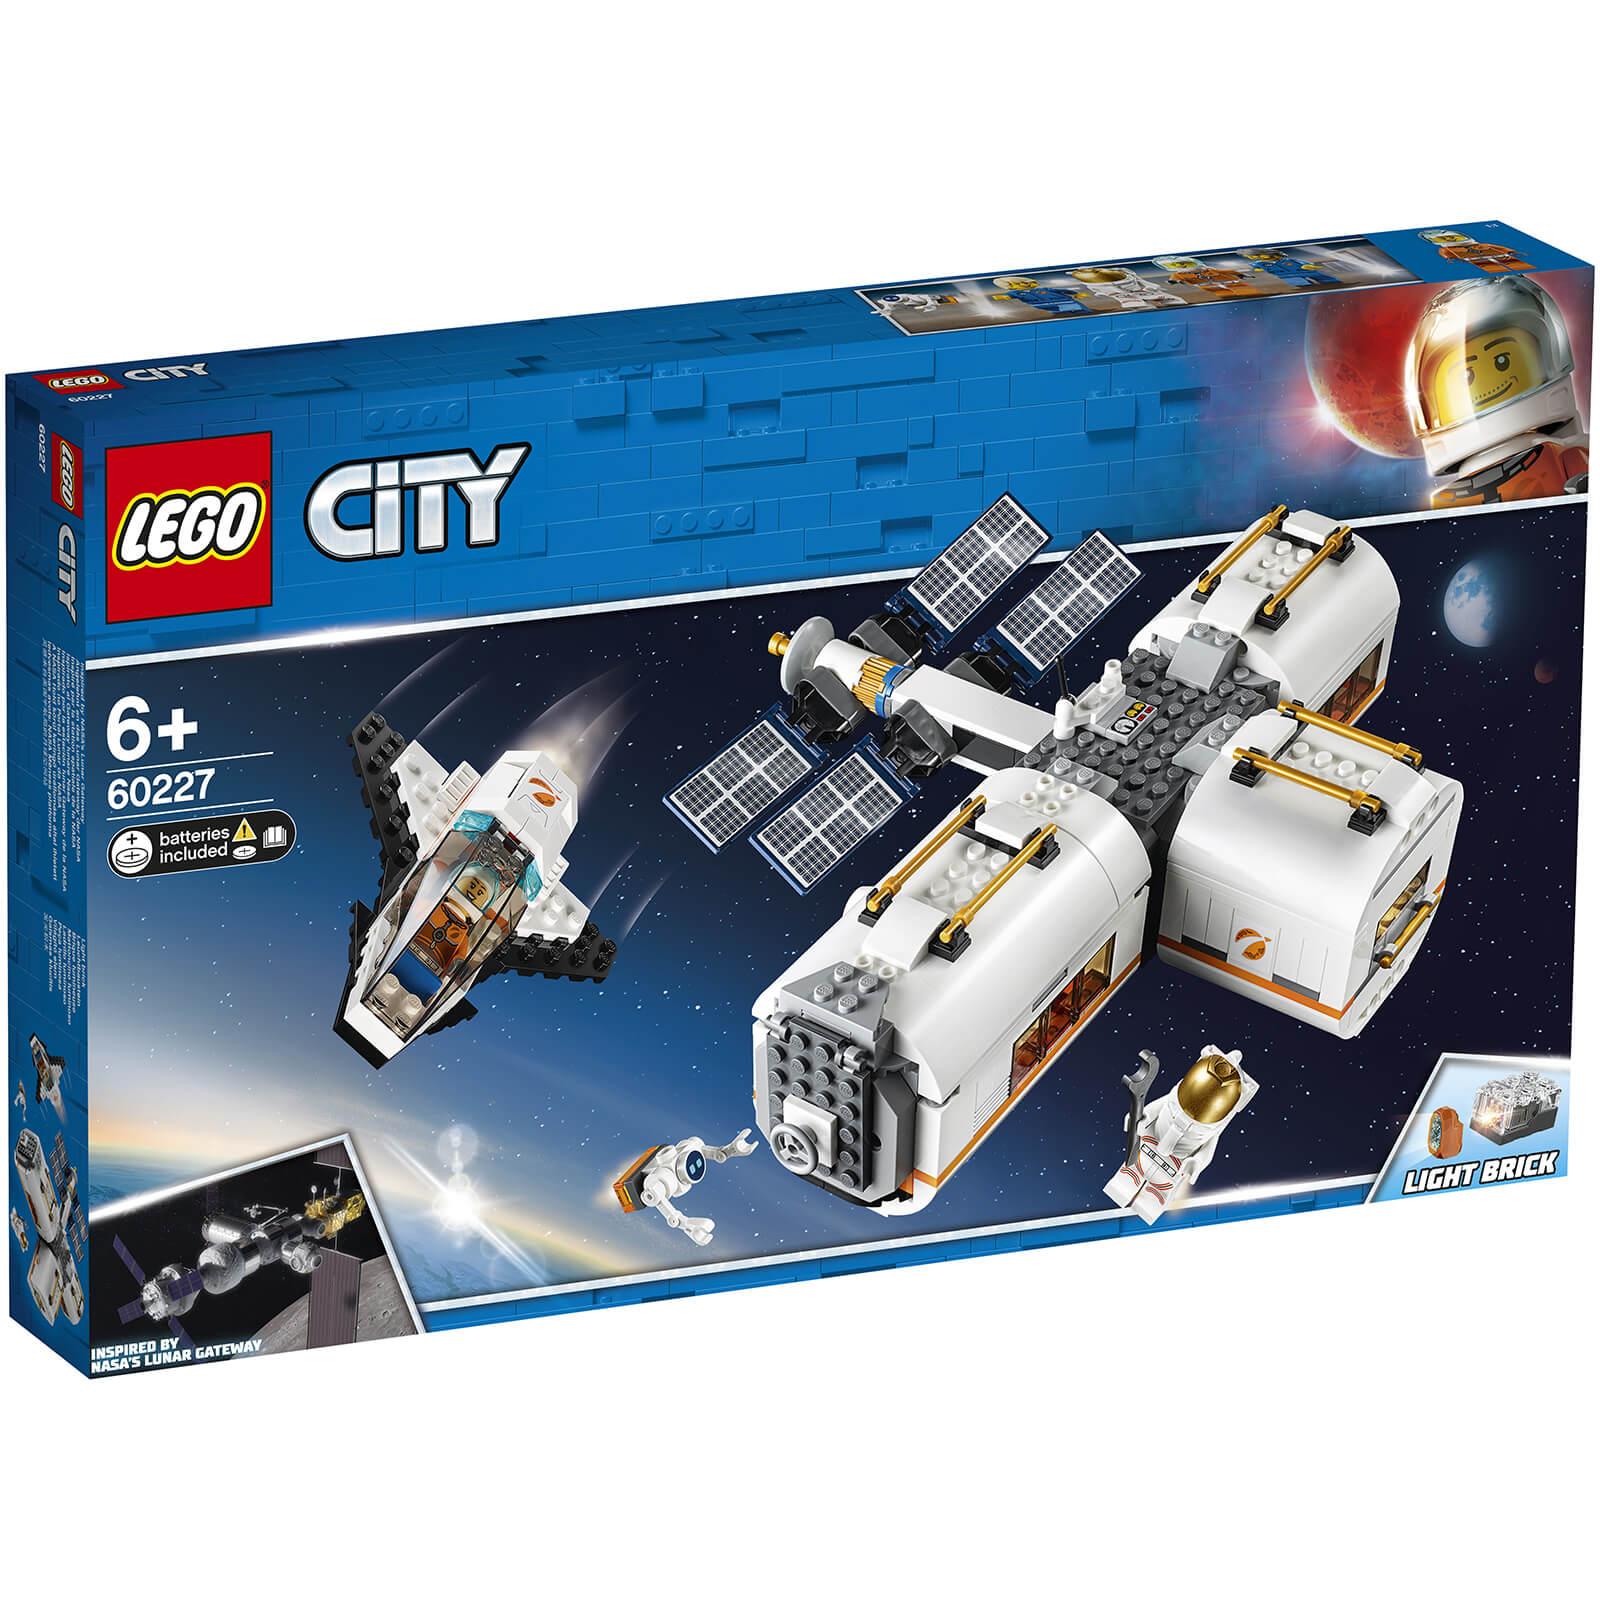 Lego City Space Port: Lunar Space Station (60227)